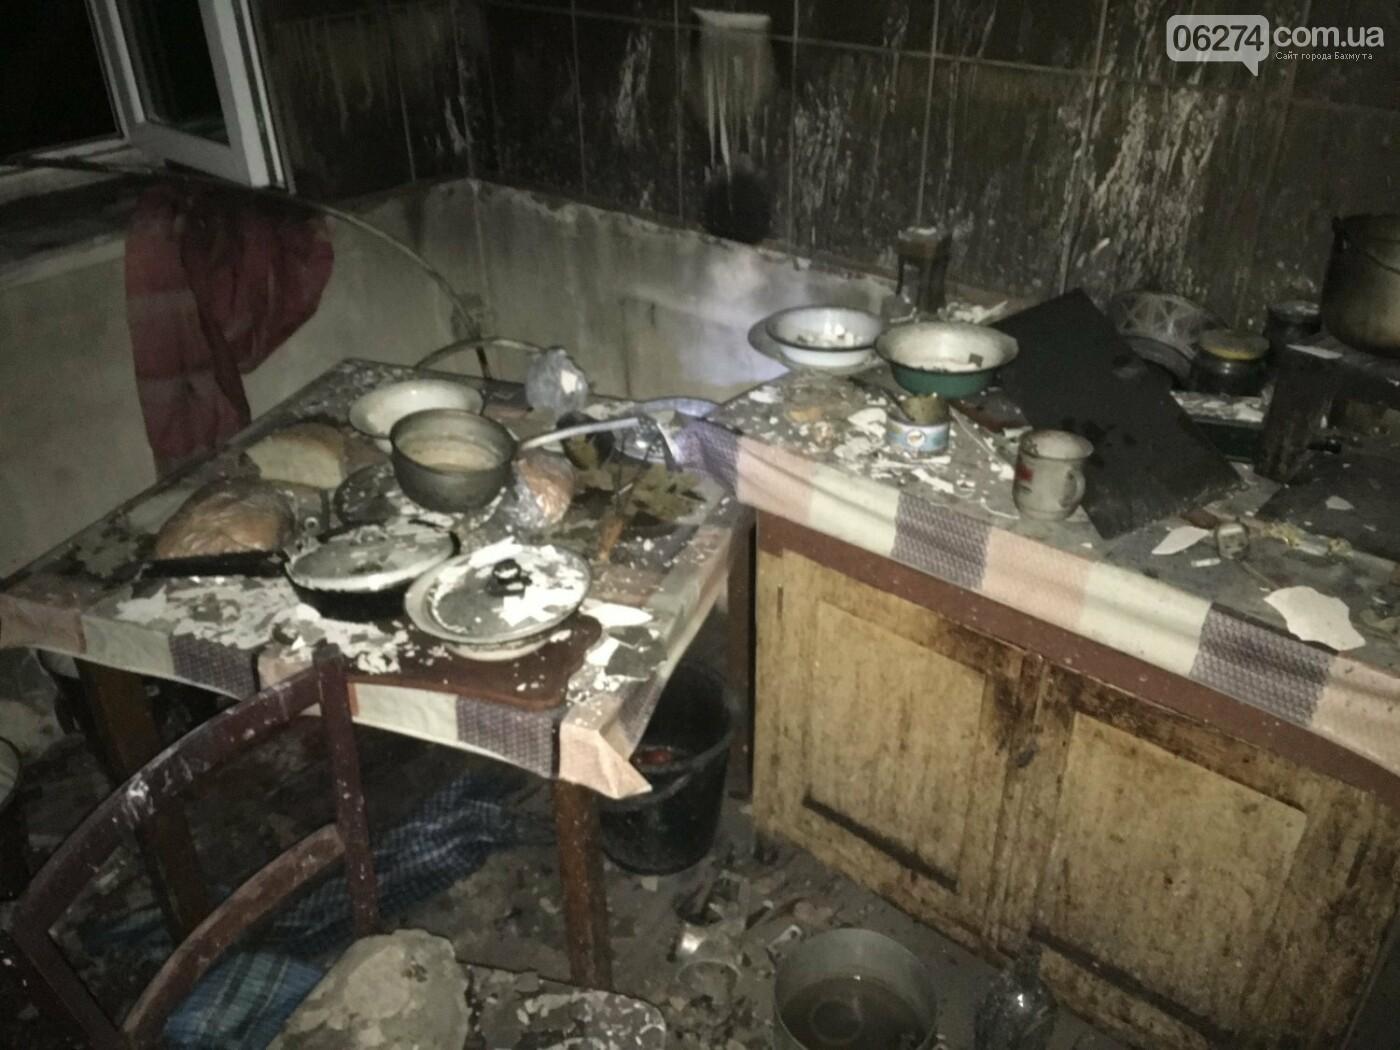 В Бахмутском районе на пожаре погиб мужчина, фото-2